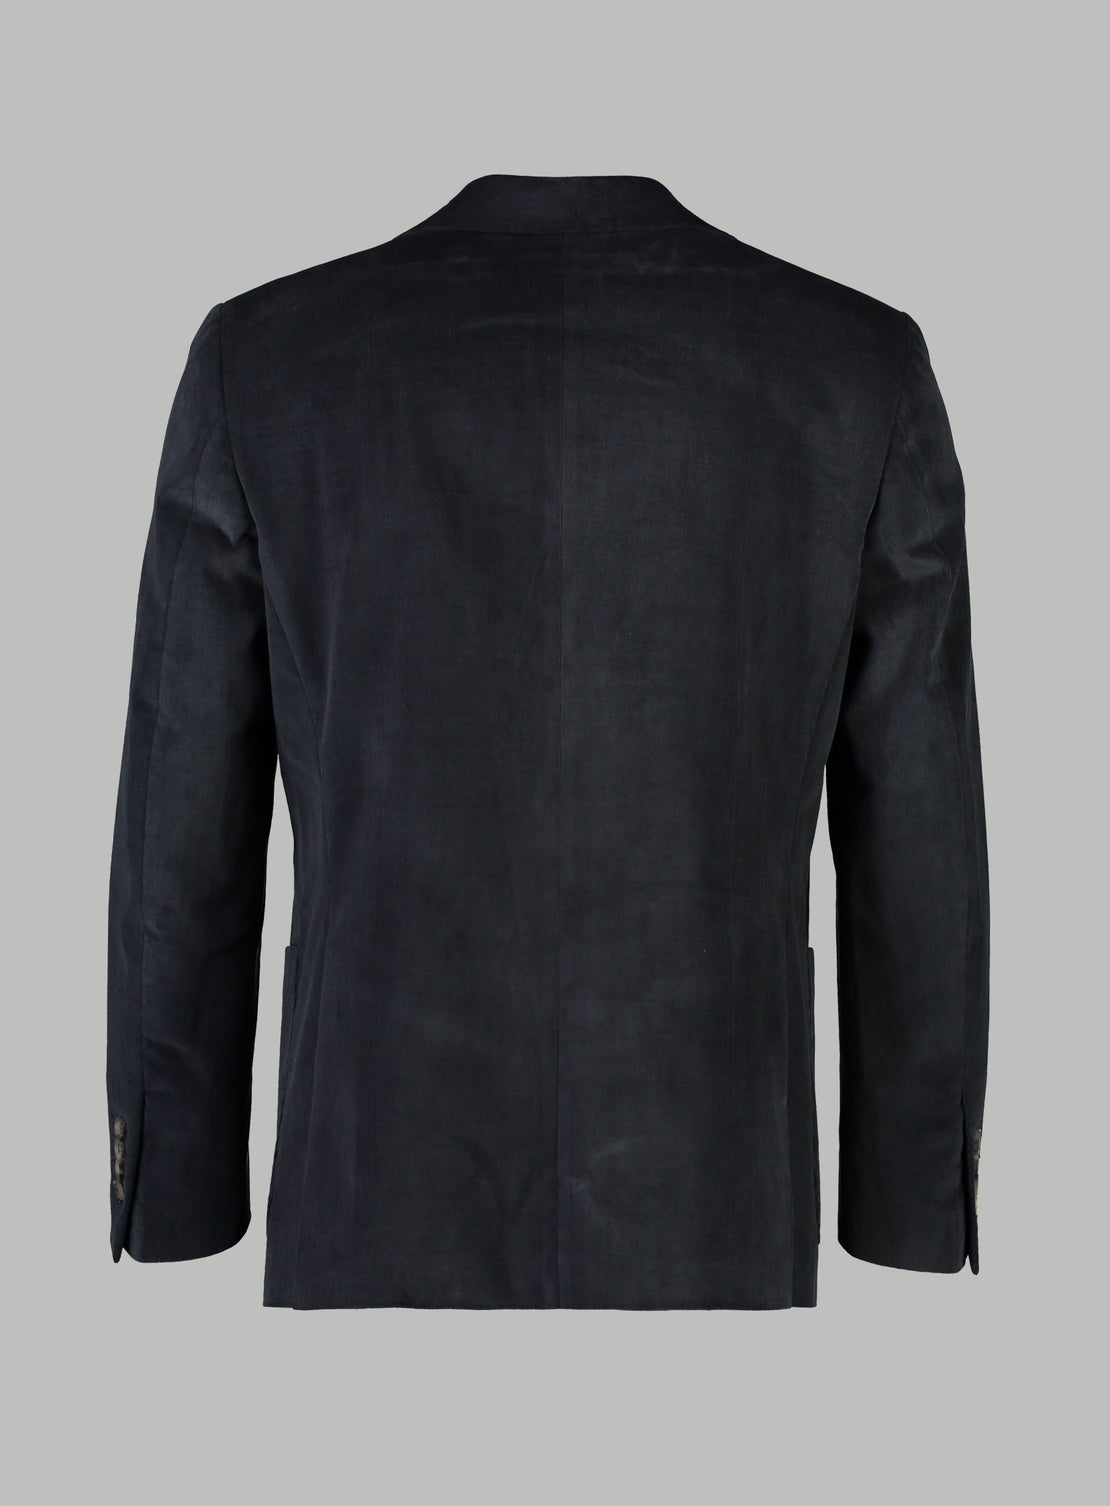 Navy Cord Separates Jacket